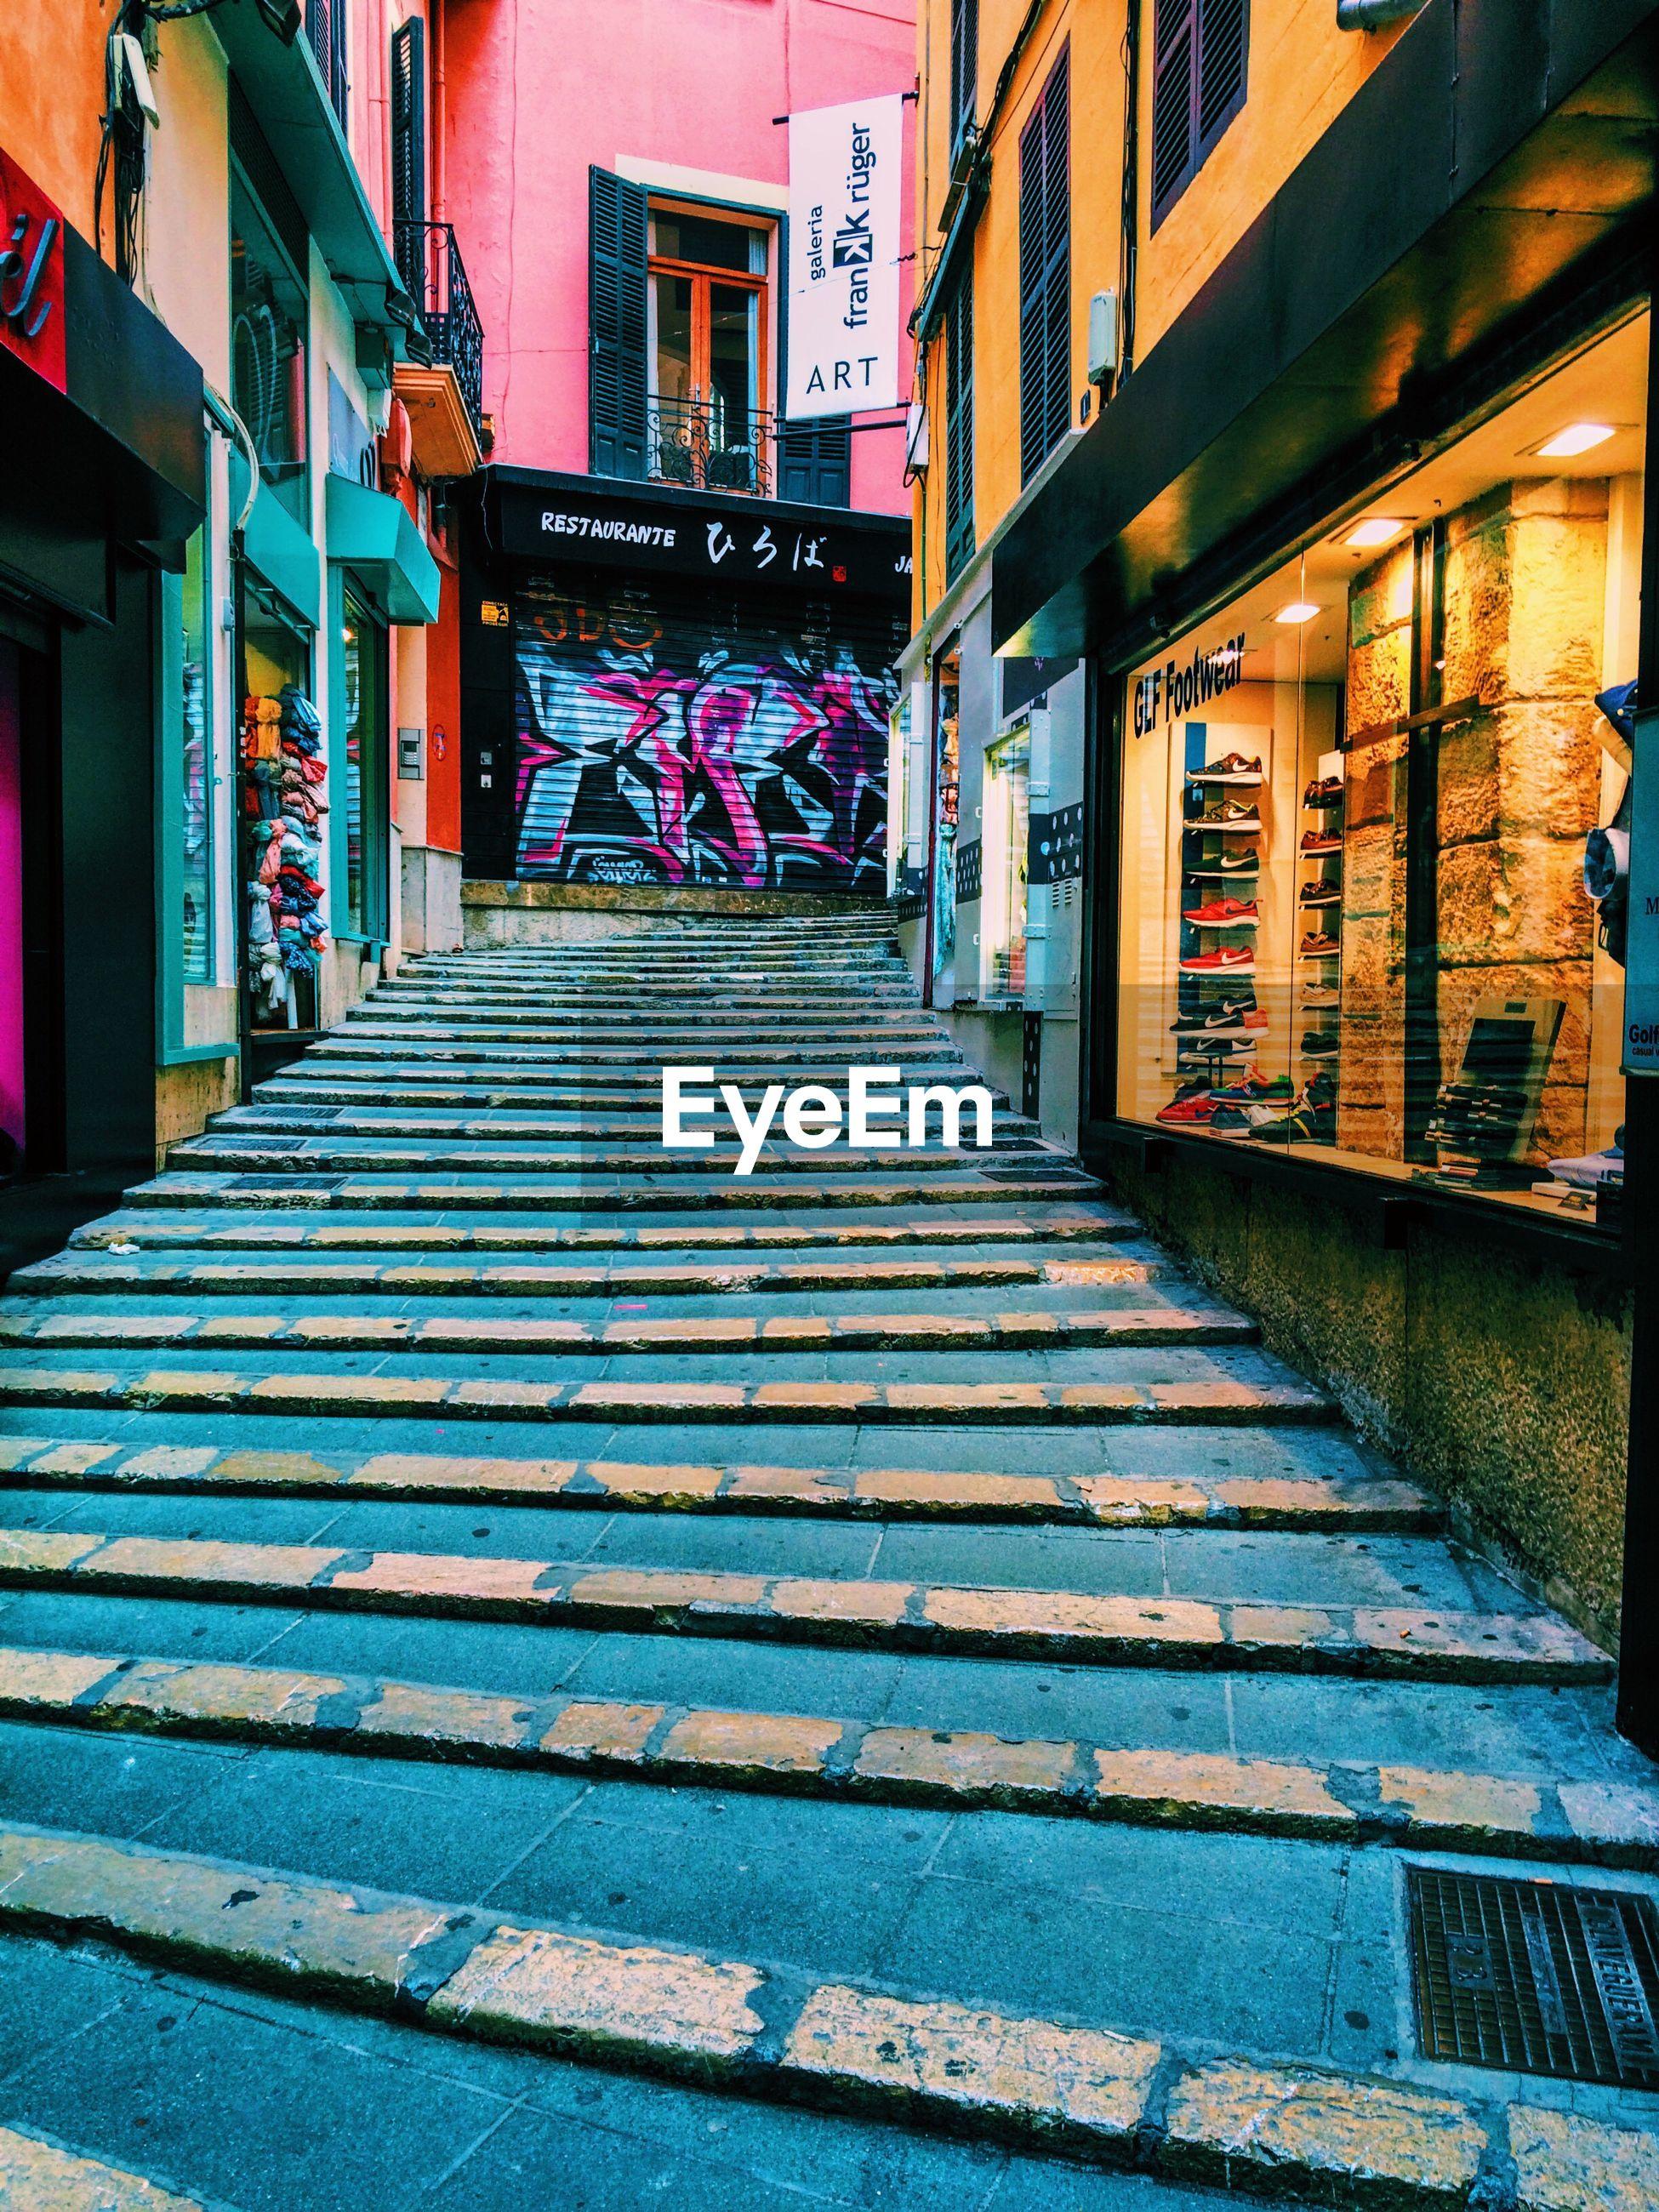 Walkway amidst stores in city